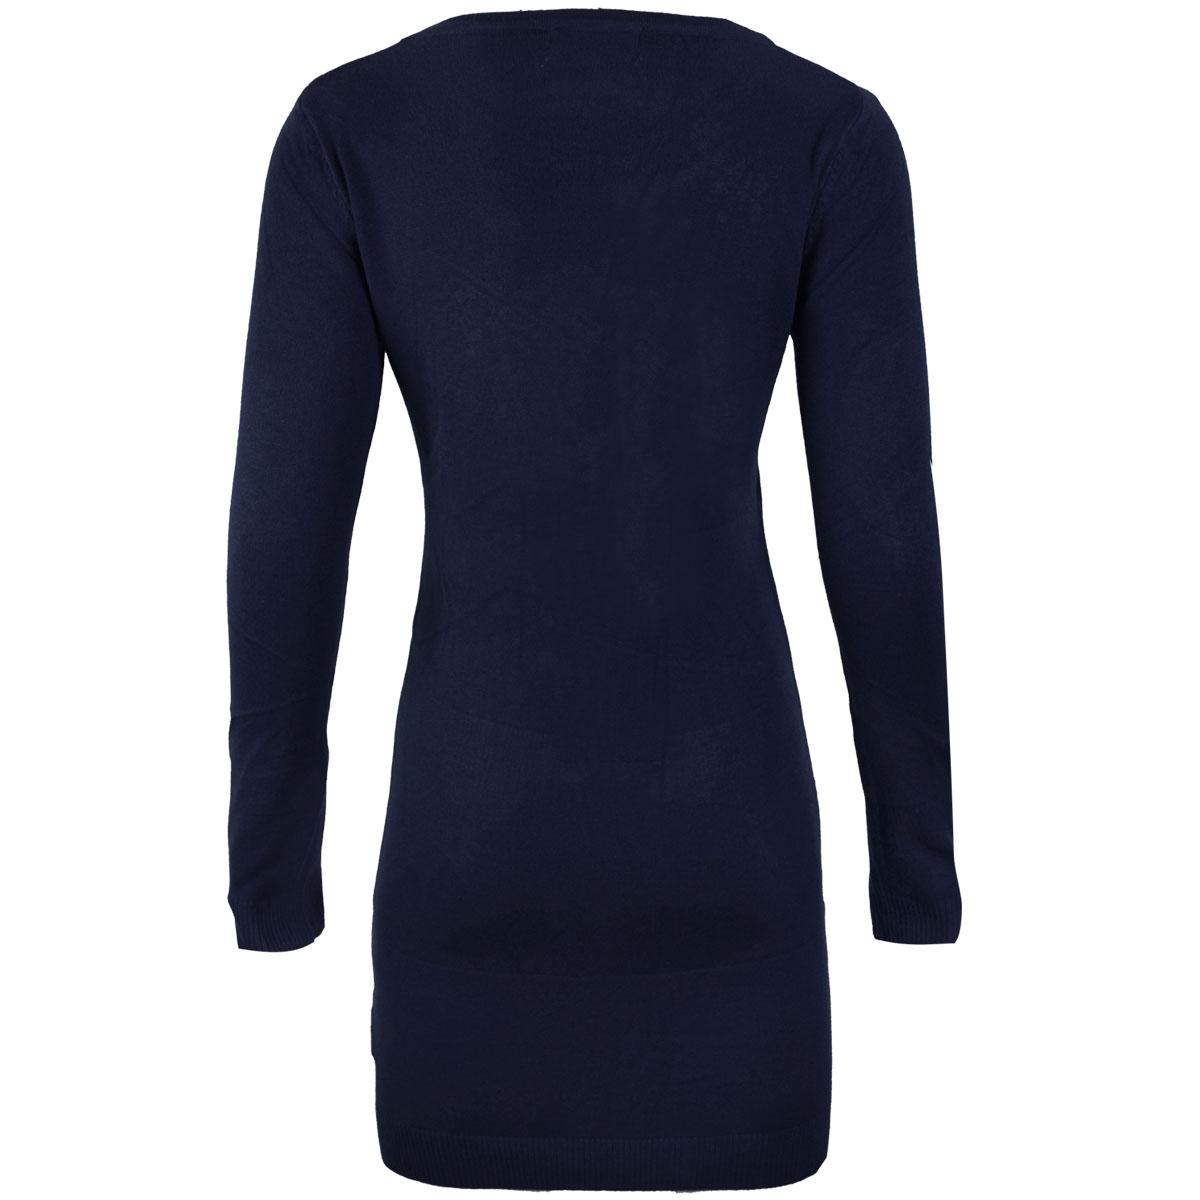 Womens Fashion Black Sweater